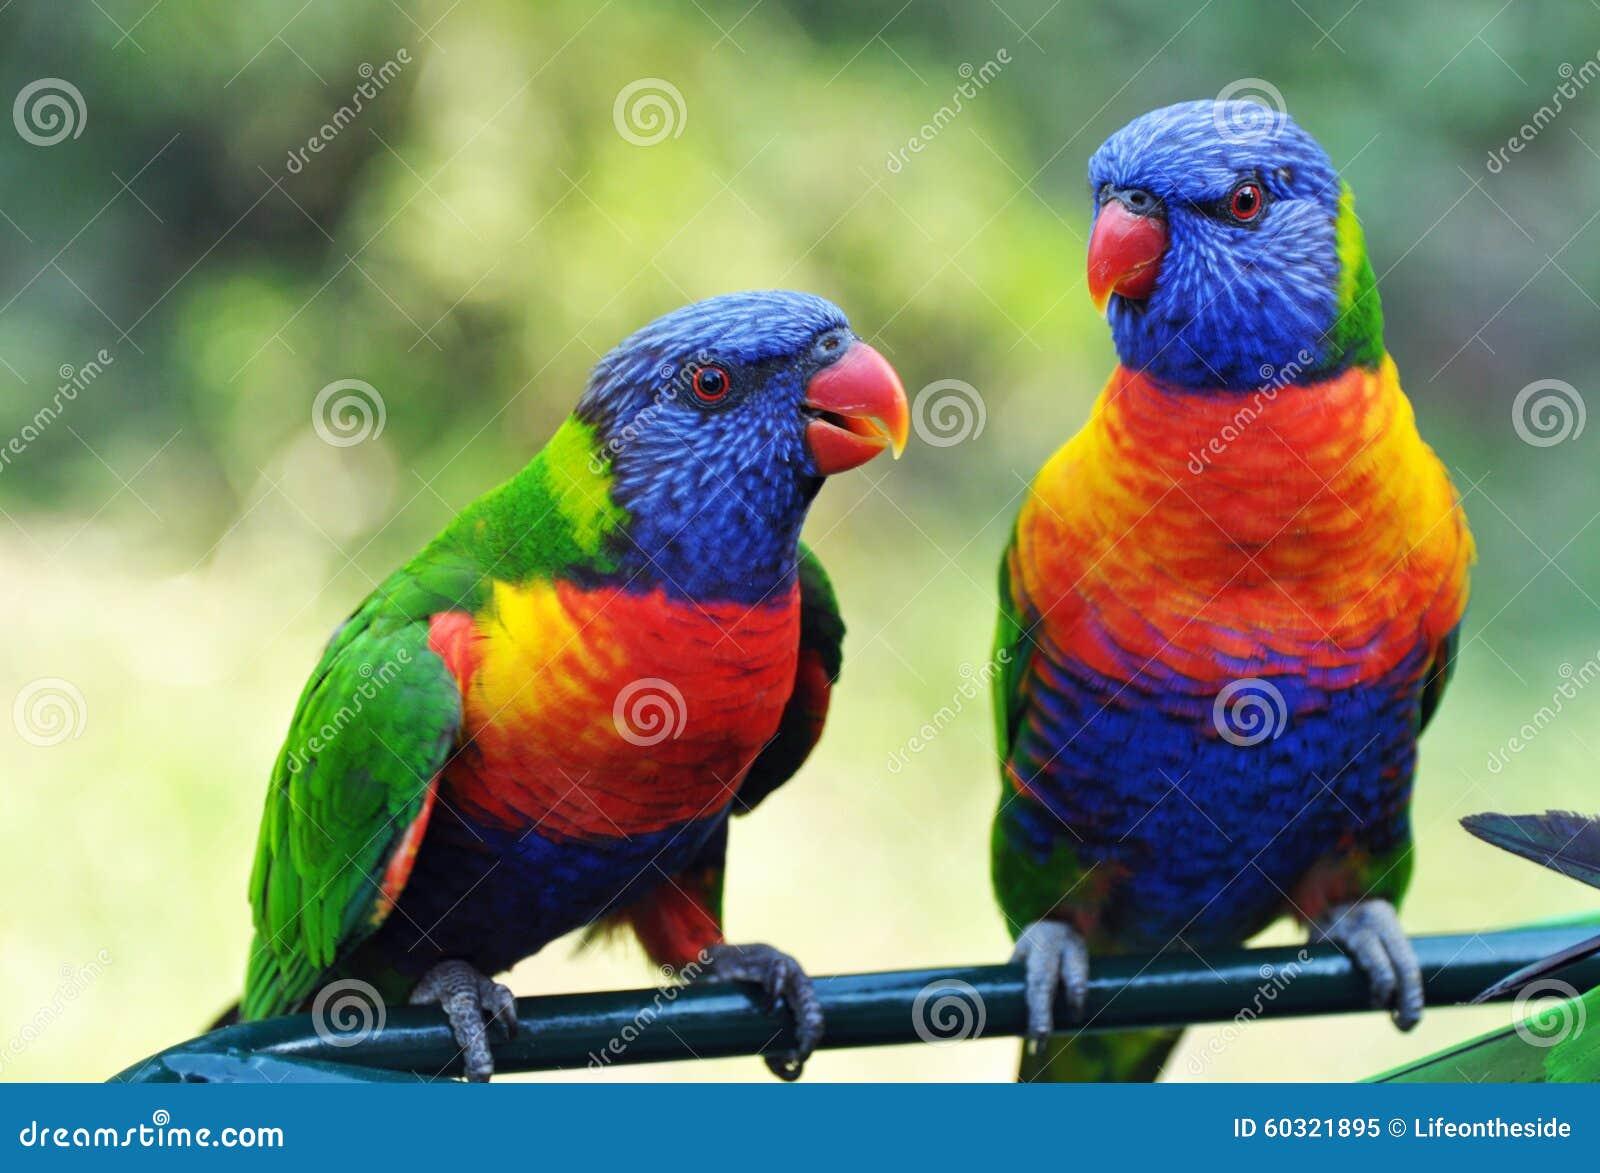 Bright vivid colors of Rainbow Lorikeets birds native to Australia